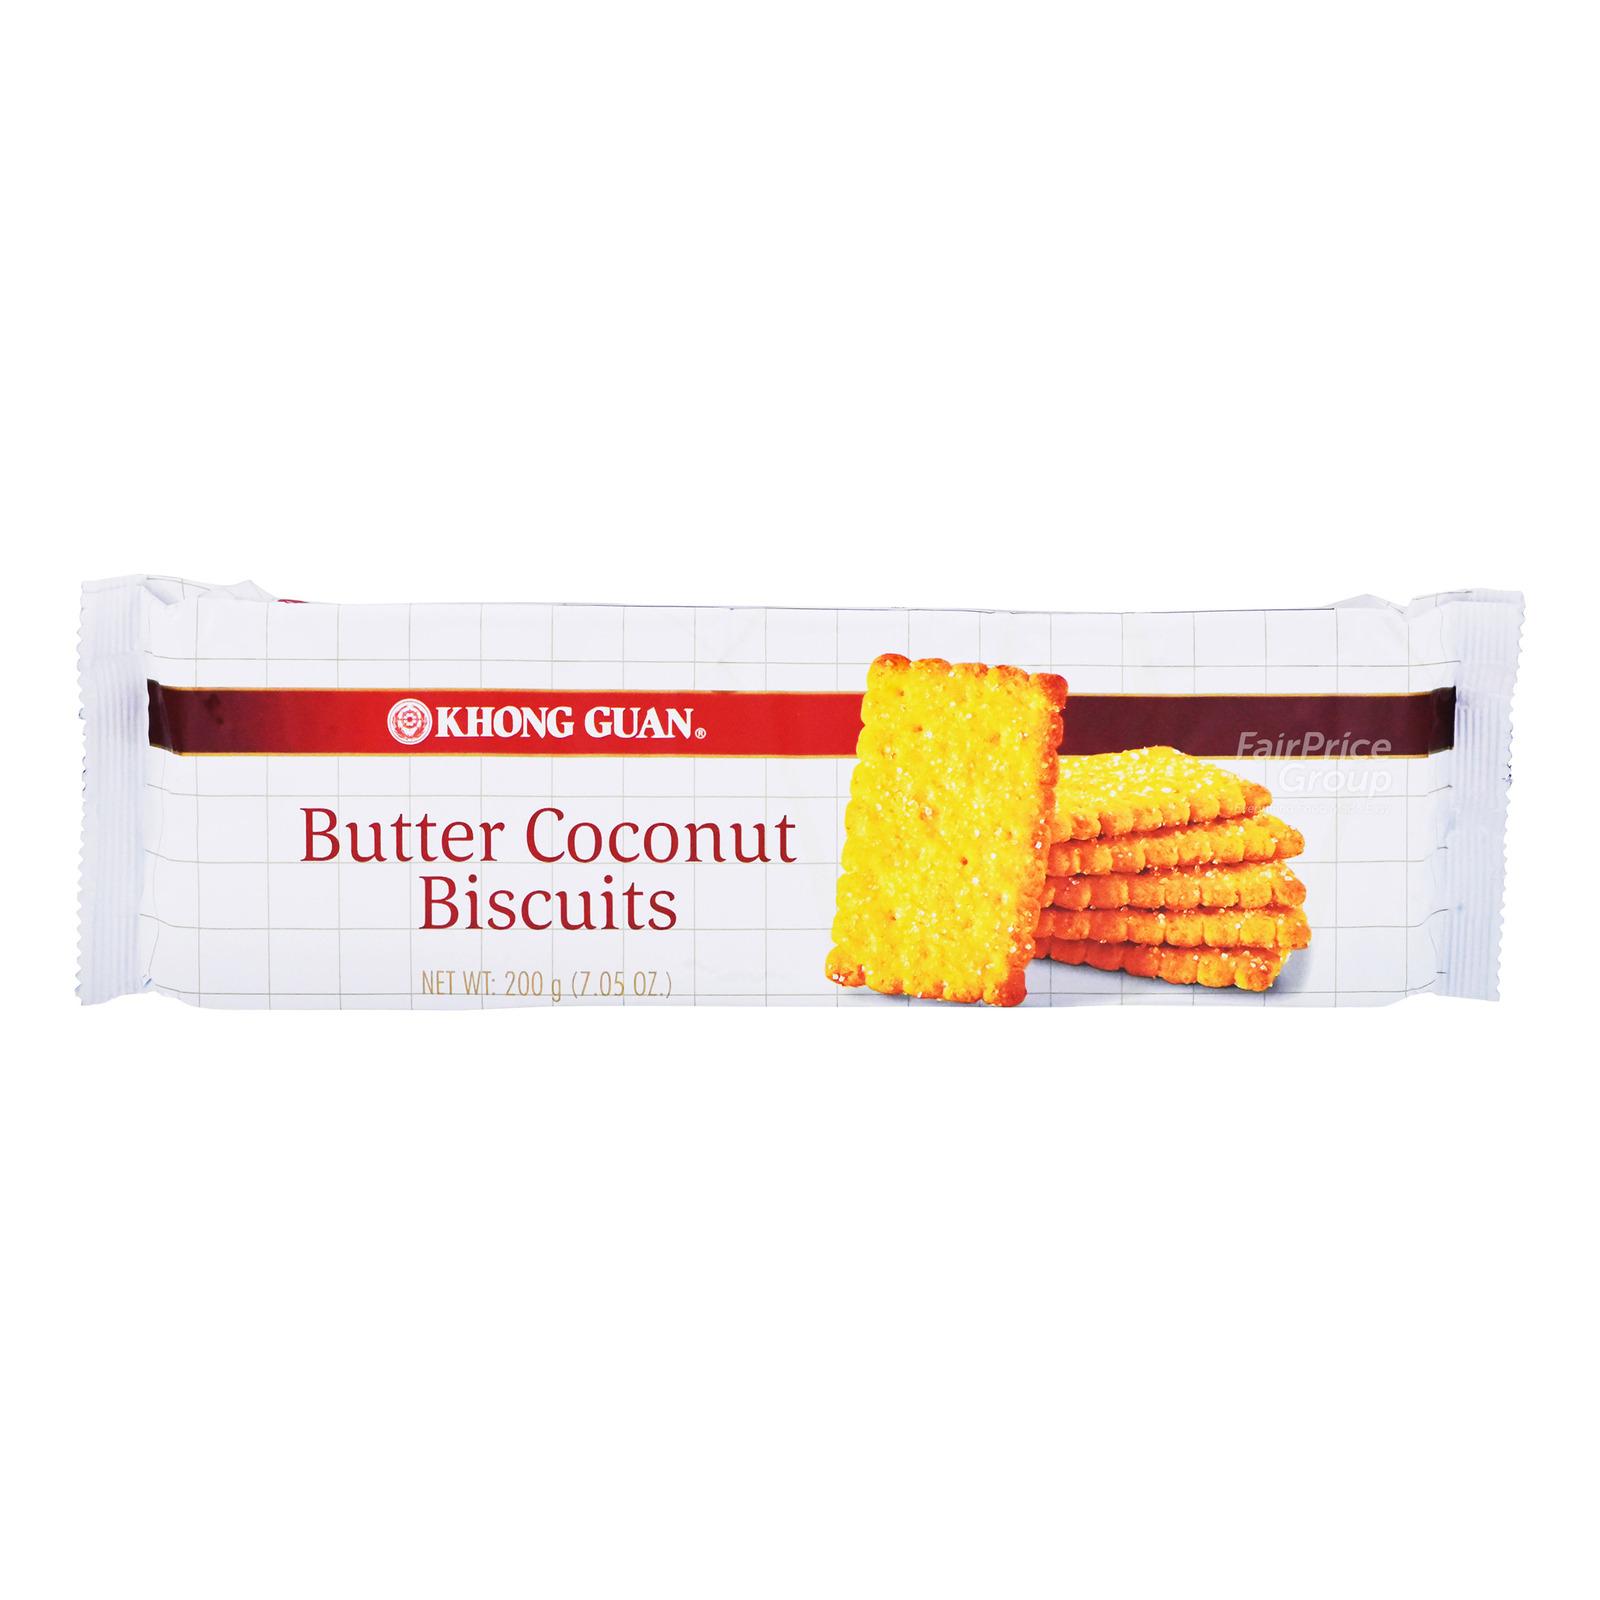 Khong Guan Biscuits - Butter Coconut